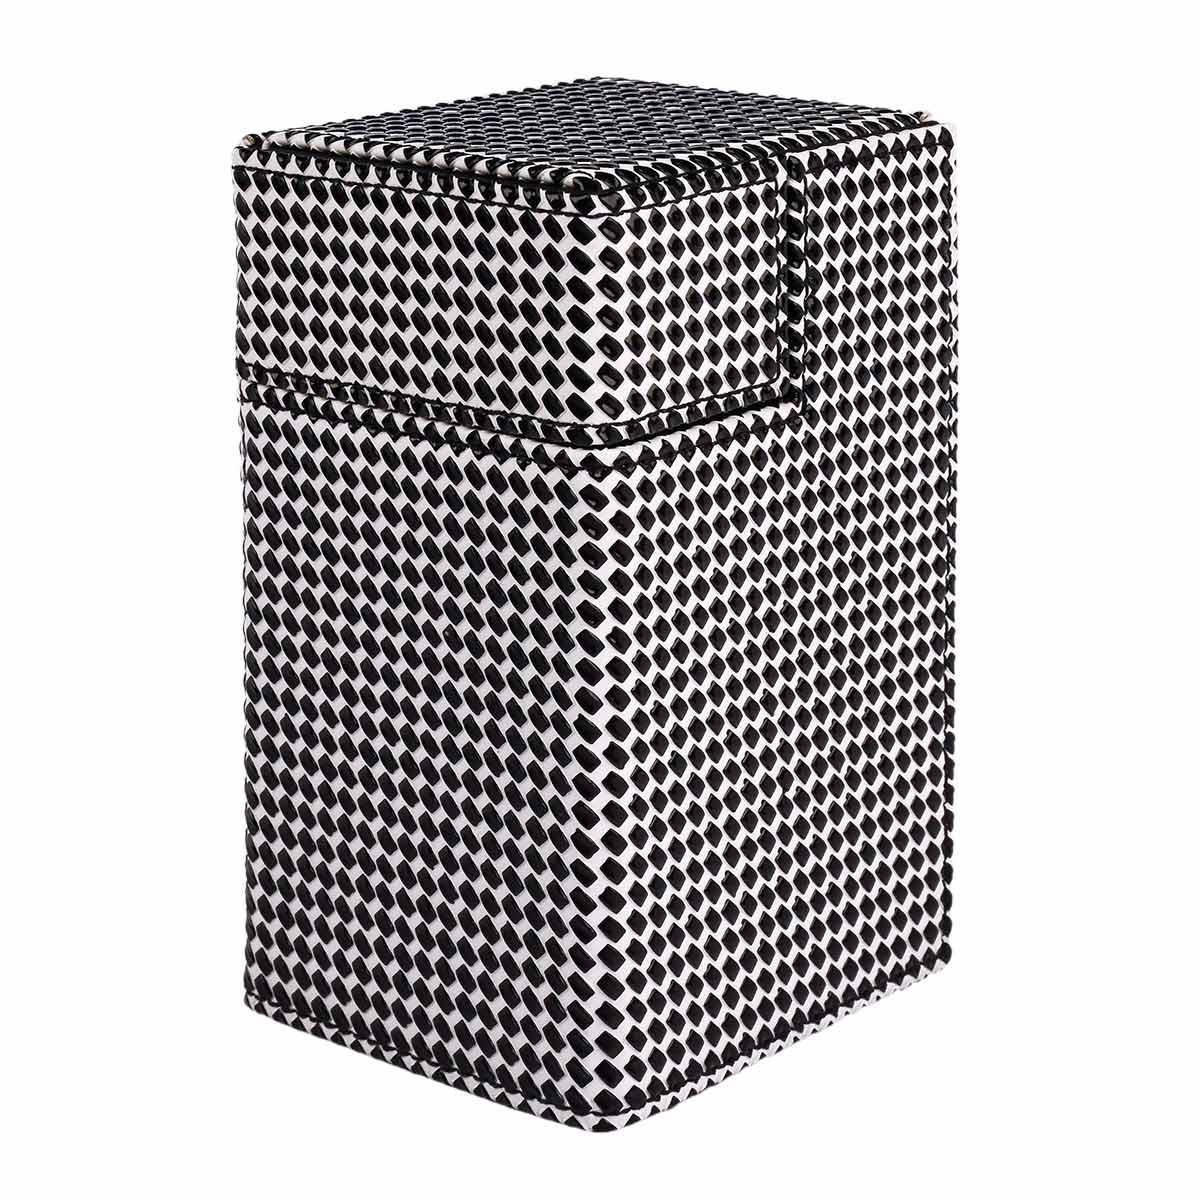 M2.1 Deck Box: Limited Edition Checkerboard Game Box